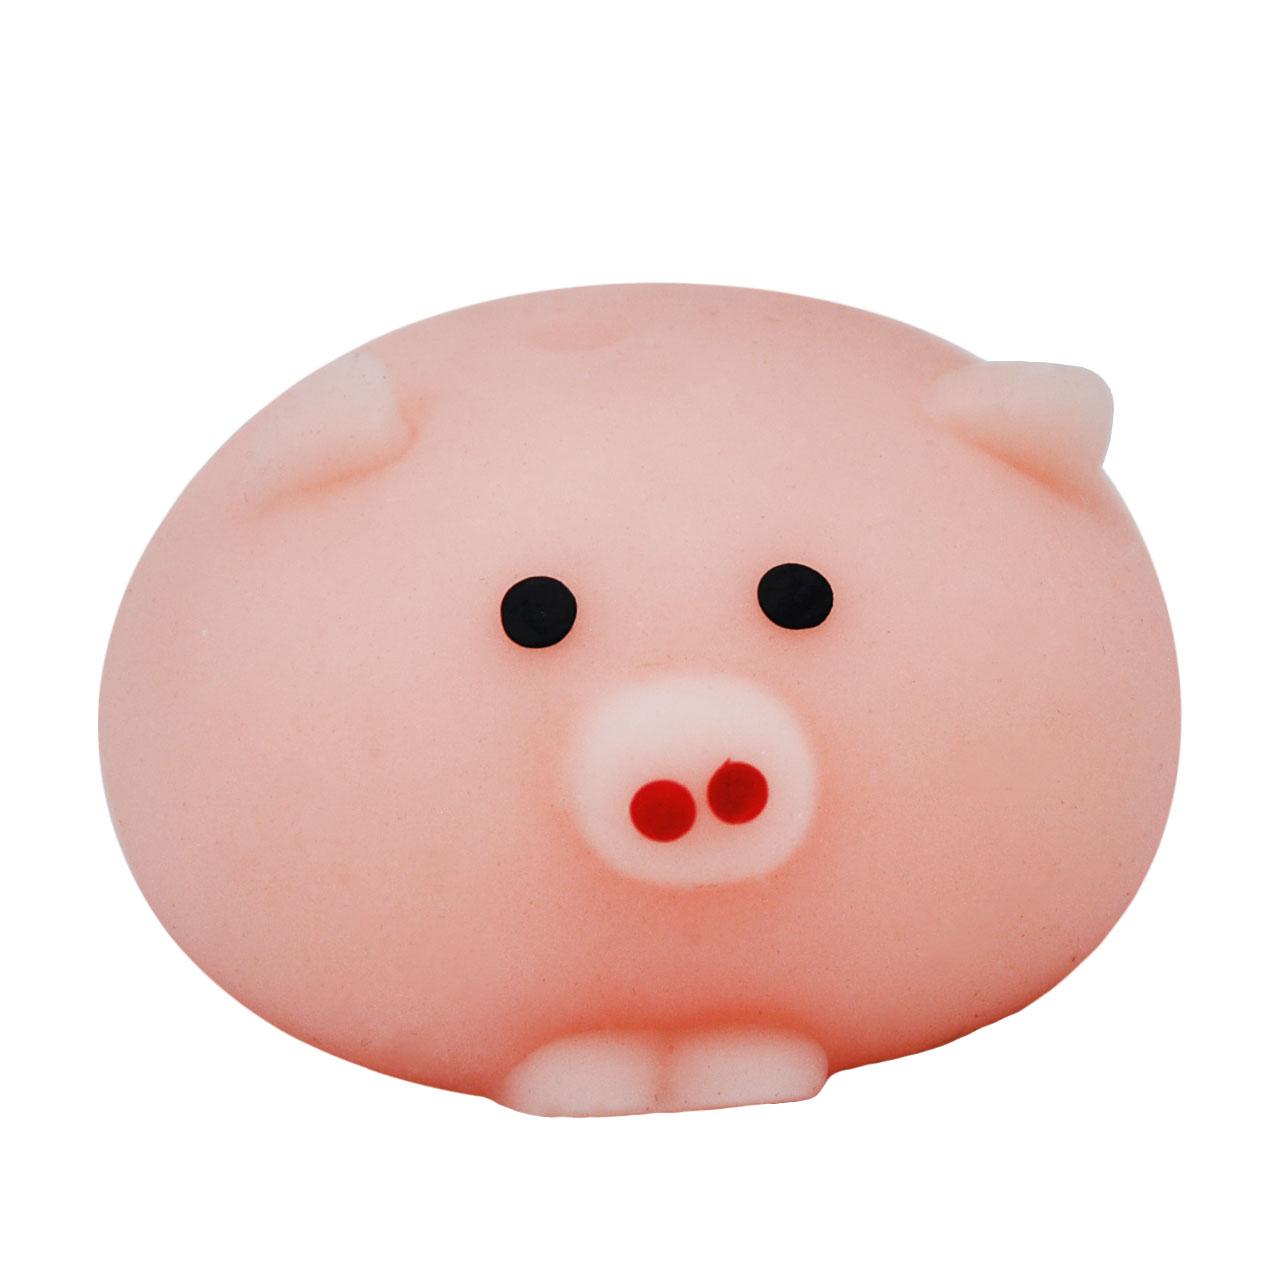 فروش                     فیجت طرح pigi کد B10078